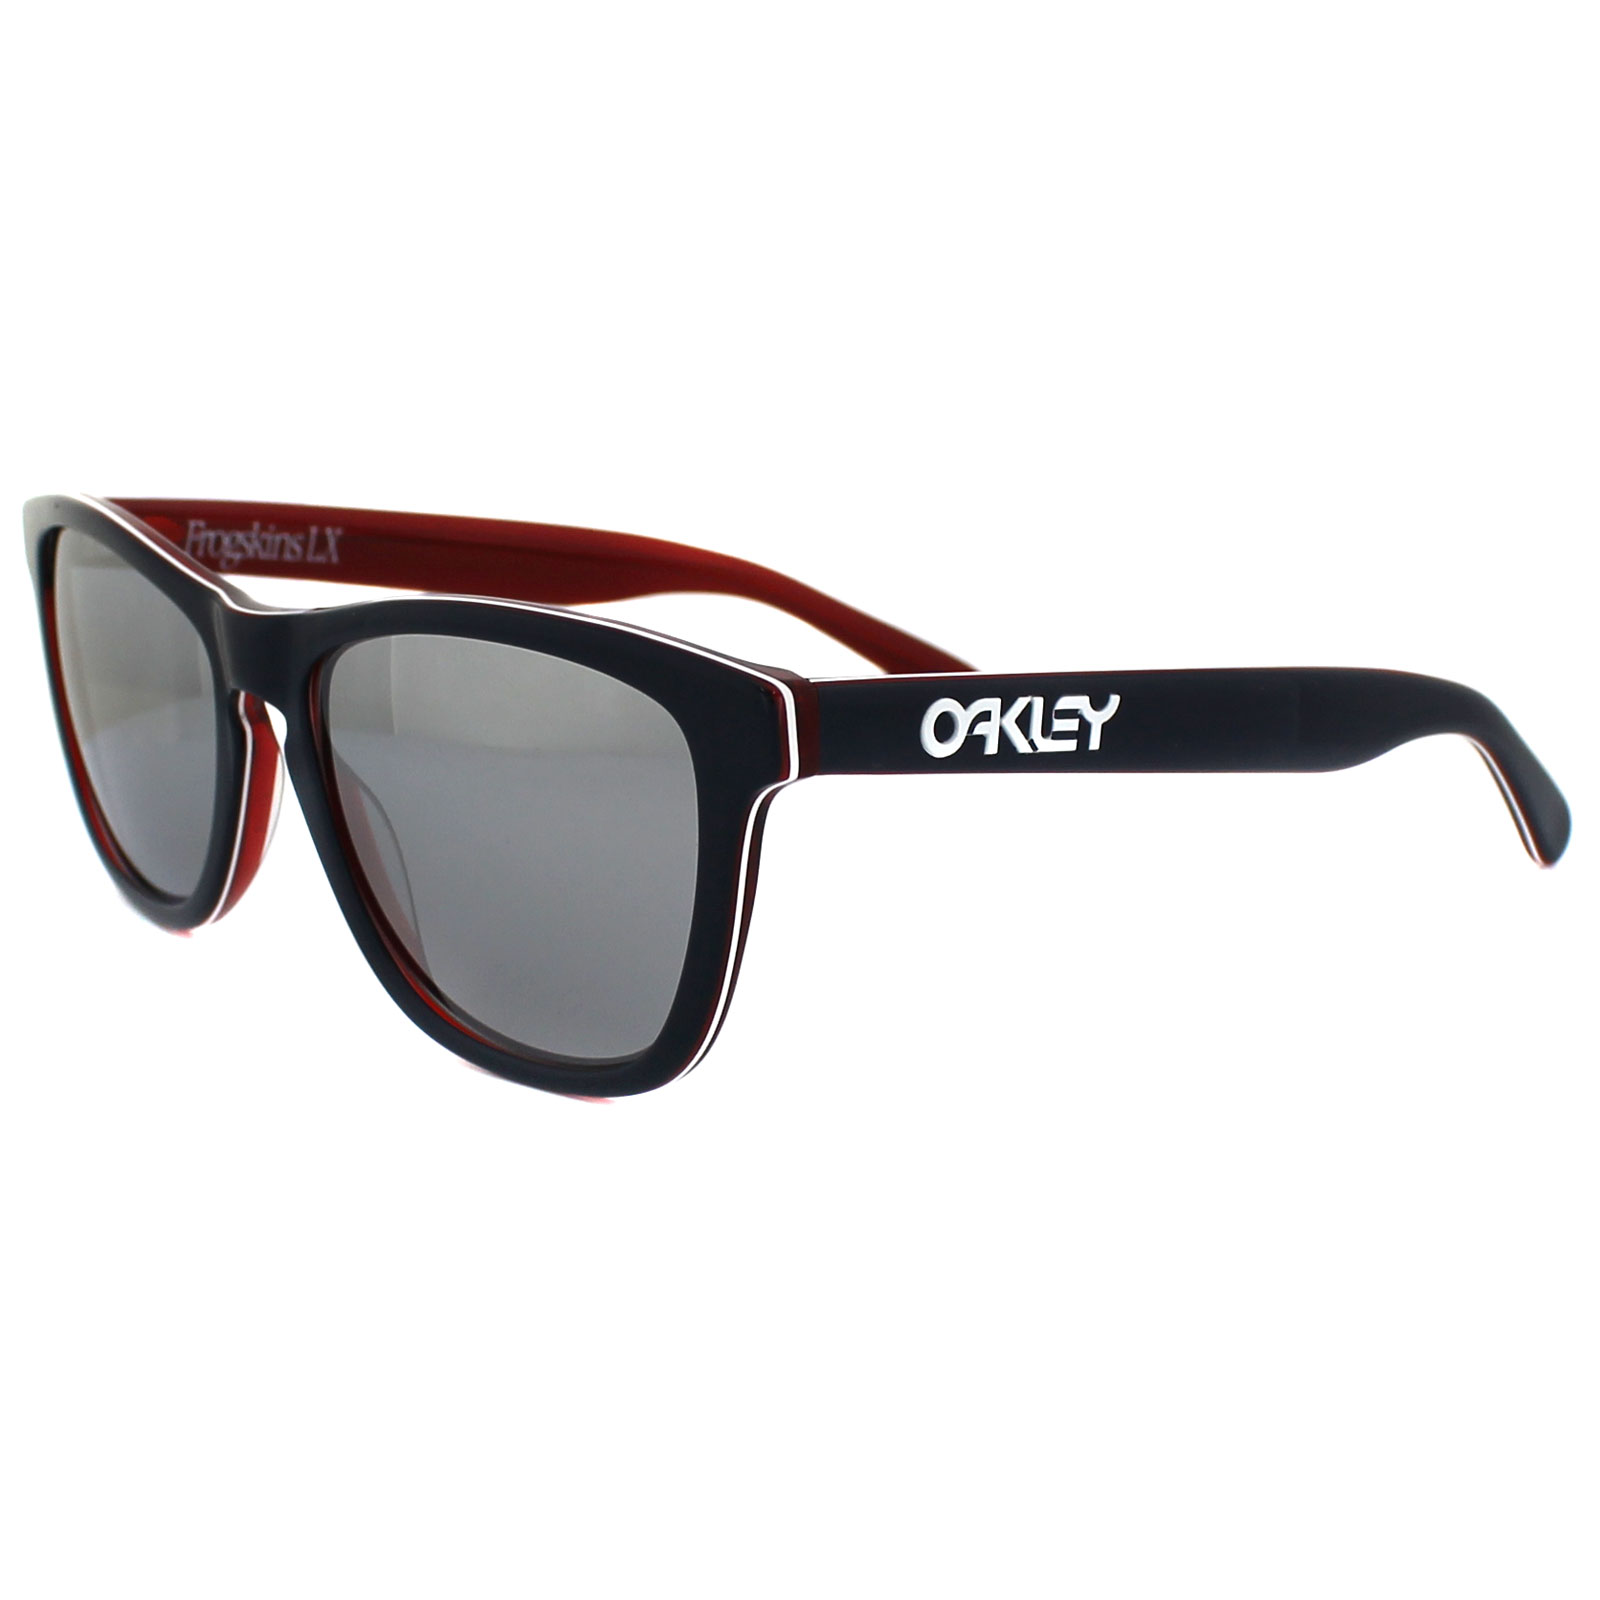 856b977548 Sentinel Oakley Sunglasses Frogskins LX OO2043-05 Navy Chrome Iridium